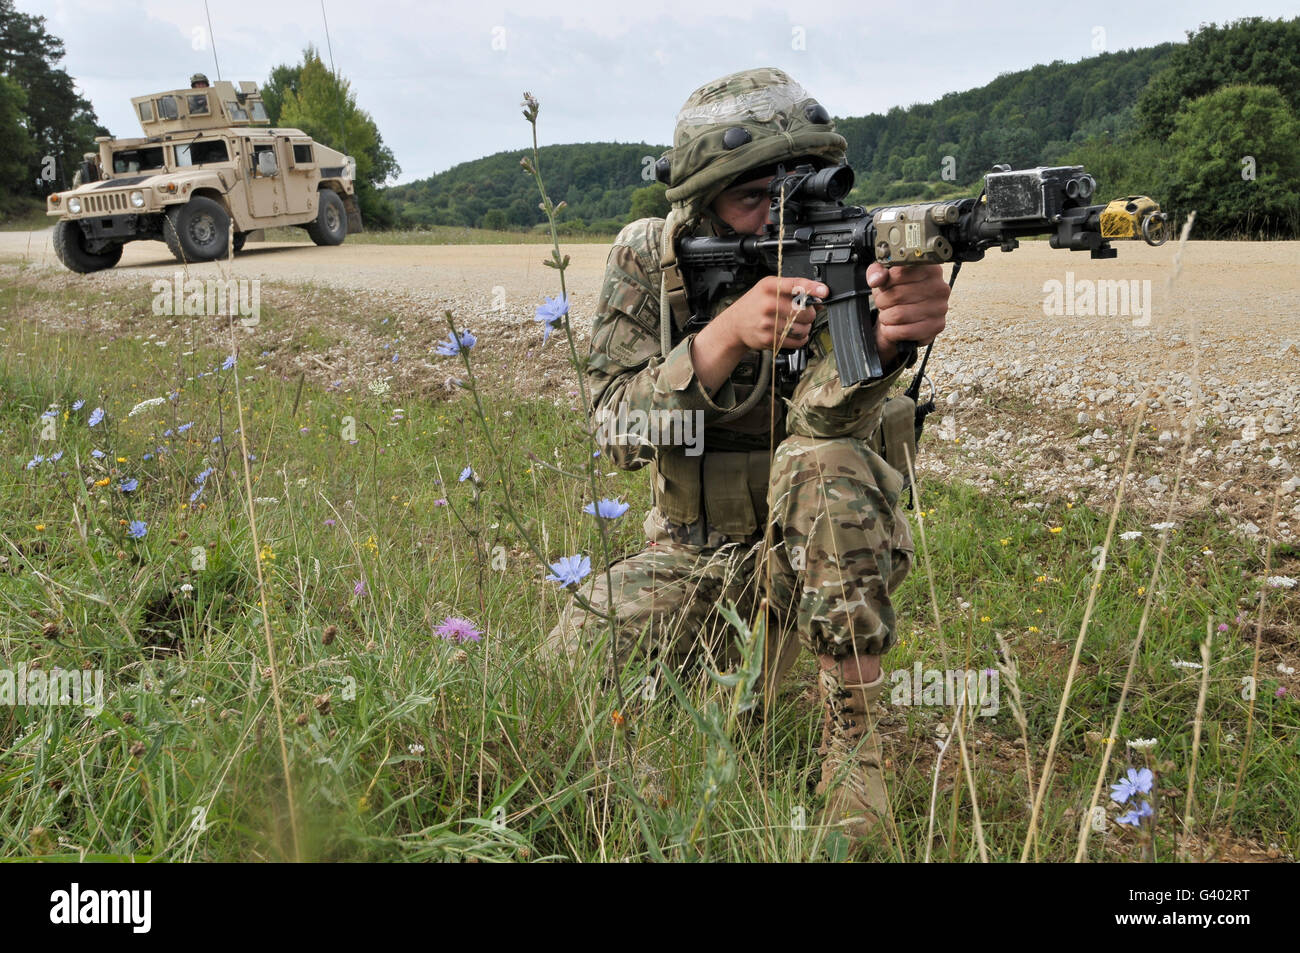 Georgian Army Sergeant aims an M4 carbine. - Stock Image